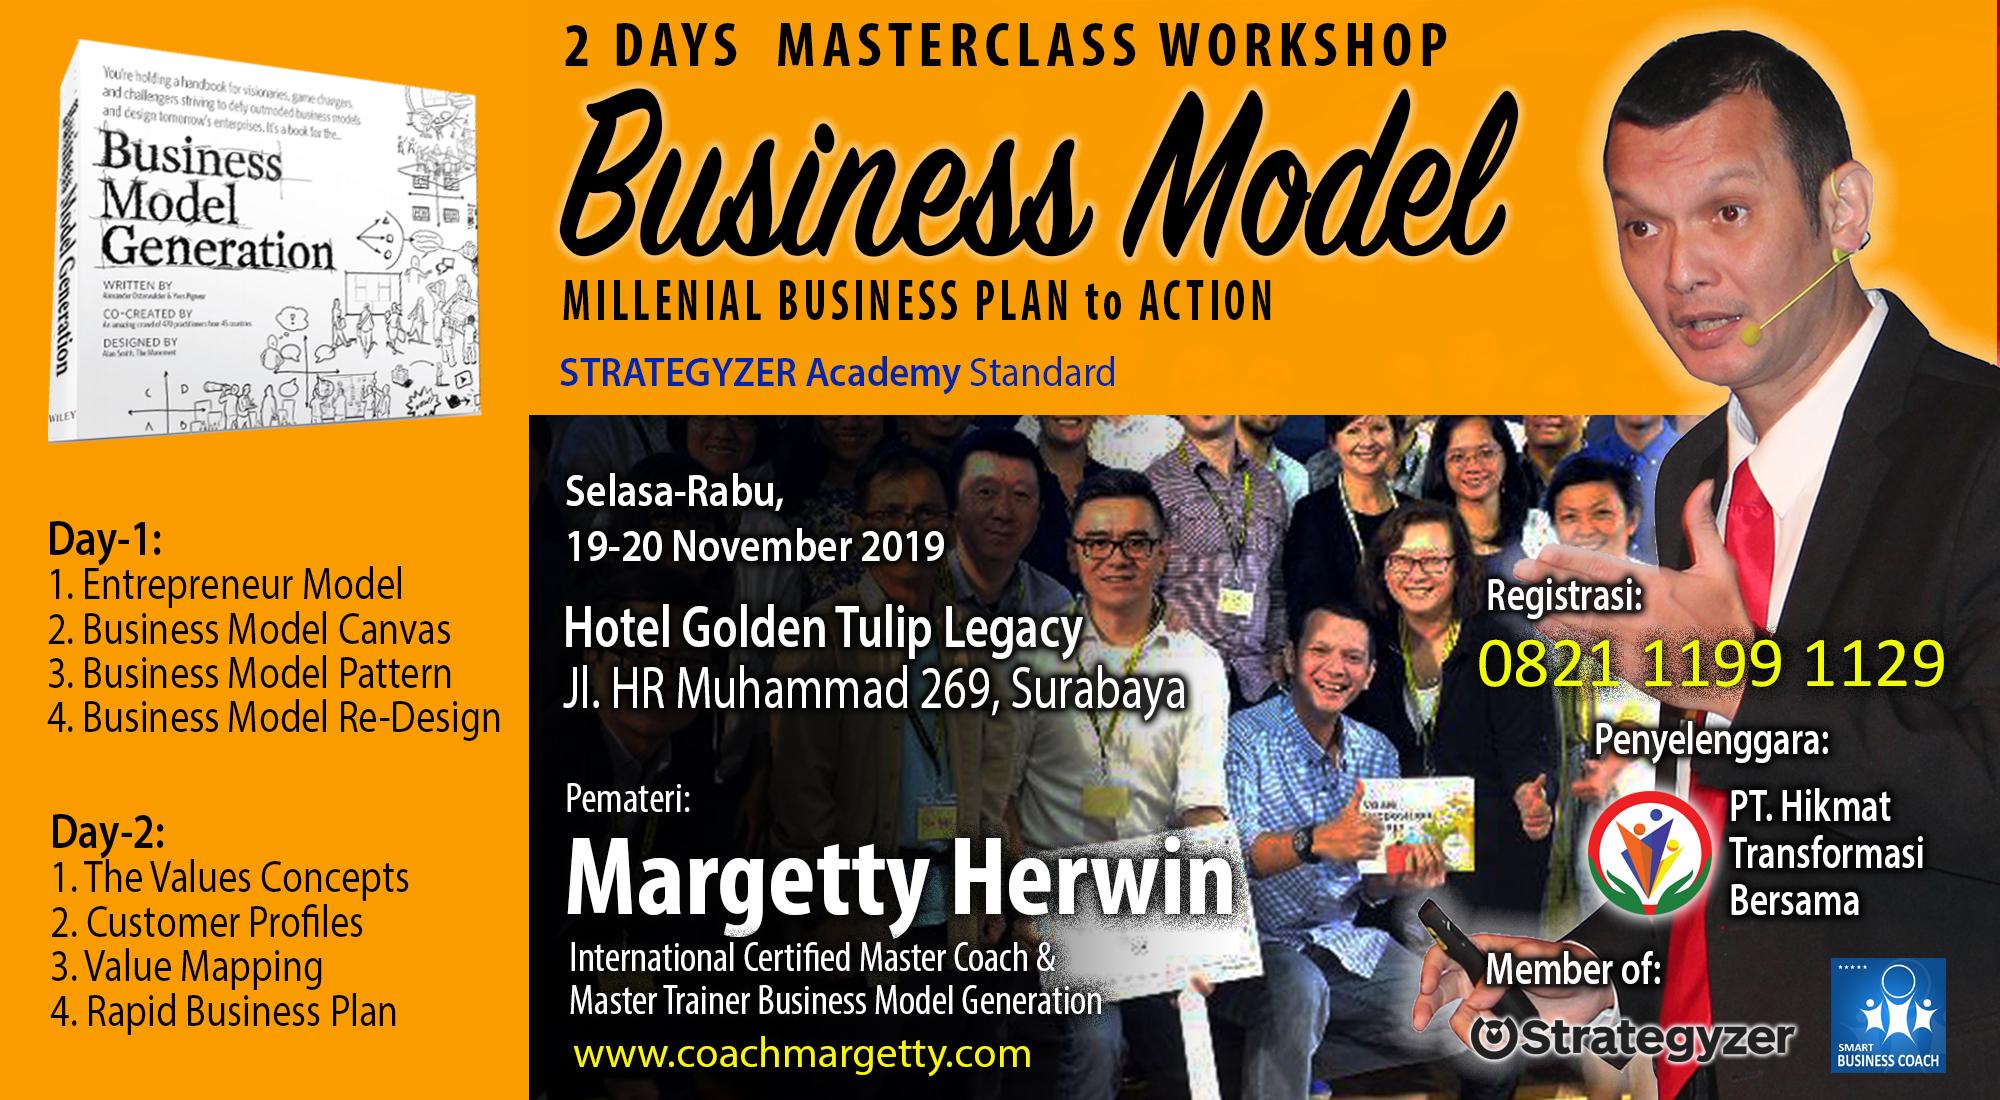 2 Days Masterclass Certification Business Model & Value Proposition Design